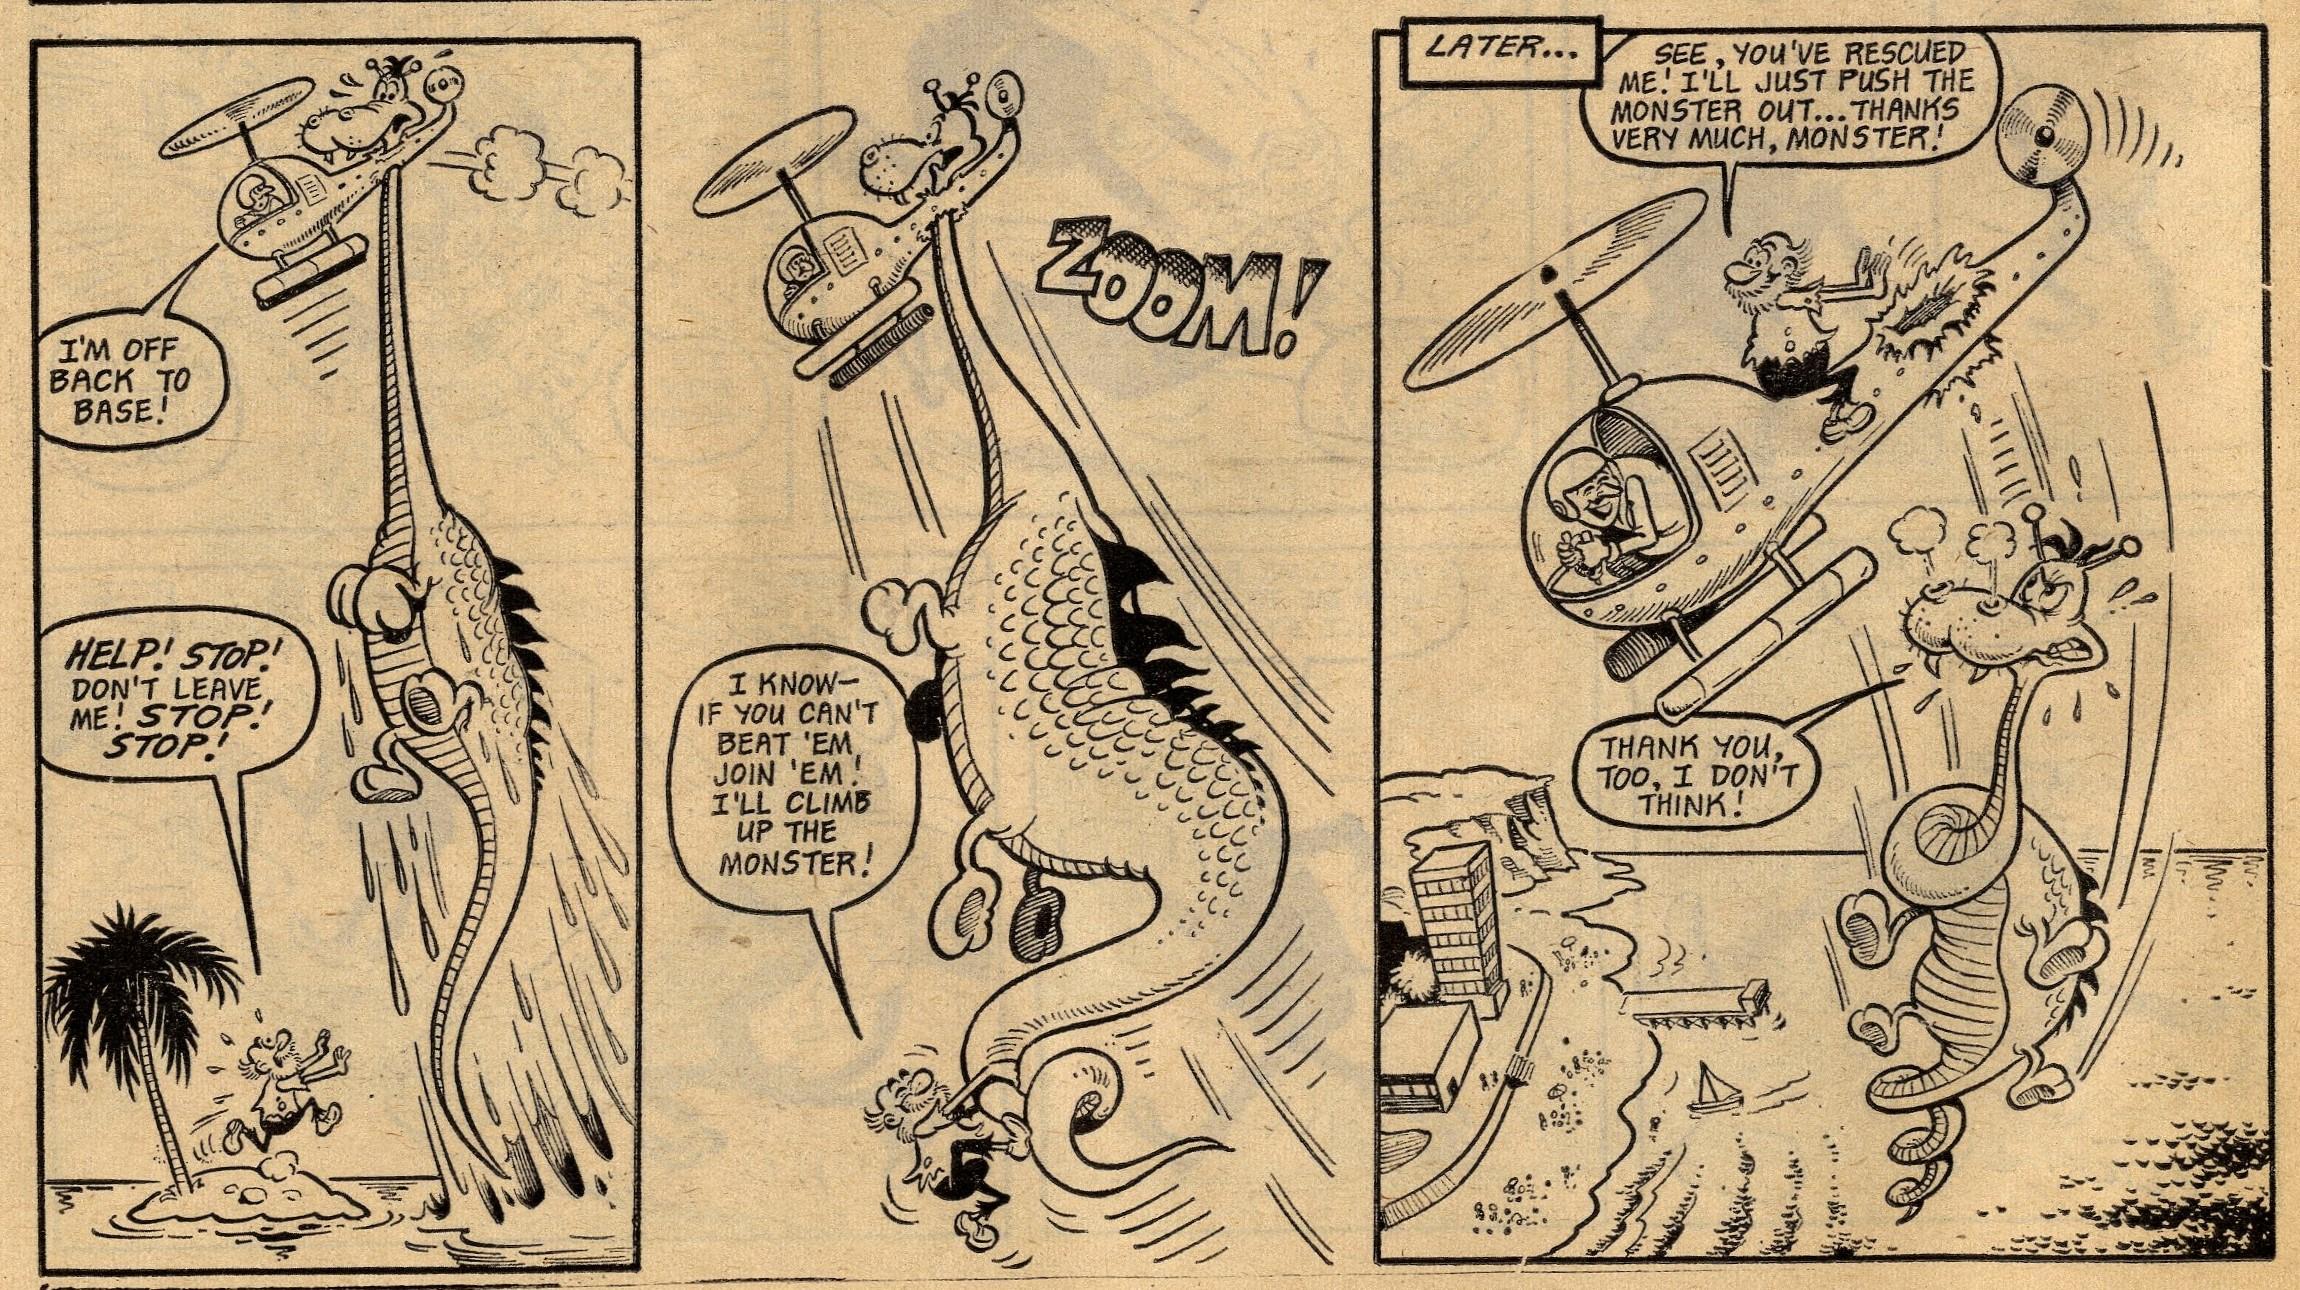 Soggy the Sea Monster: Robert Nixon (artist)